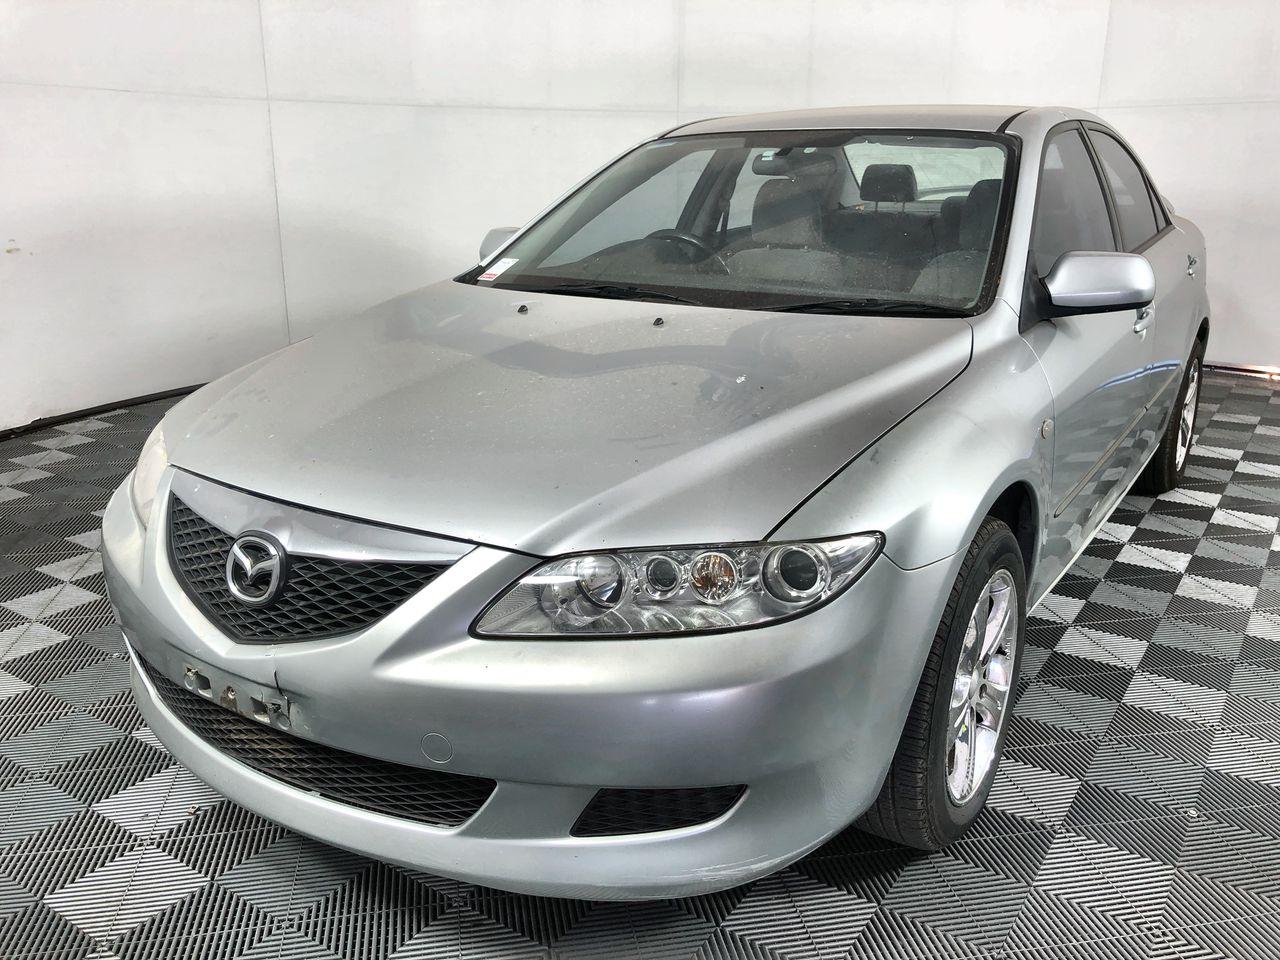 2003 Mazda 6 Classic GG Manual Sedan